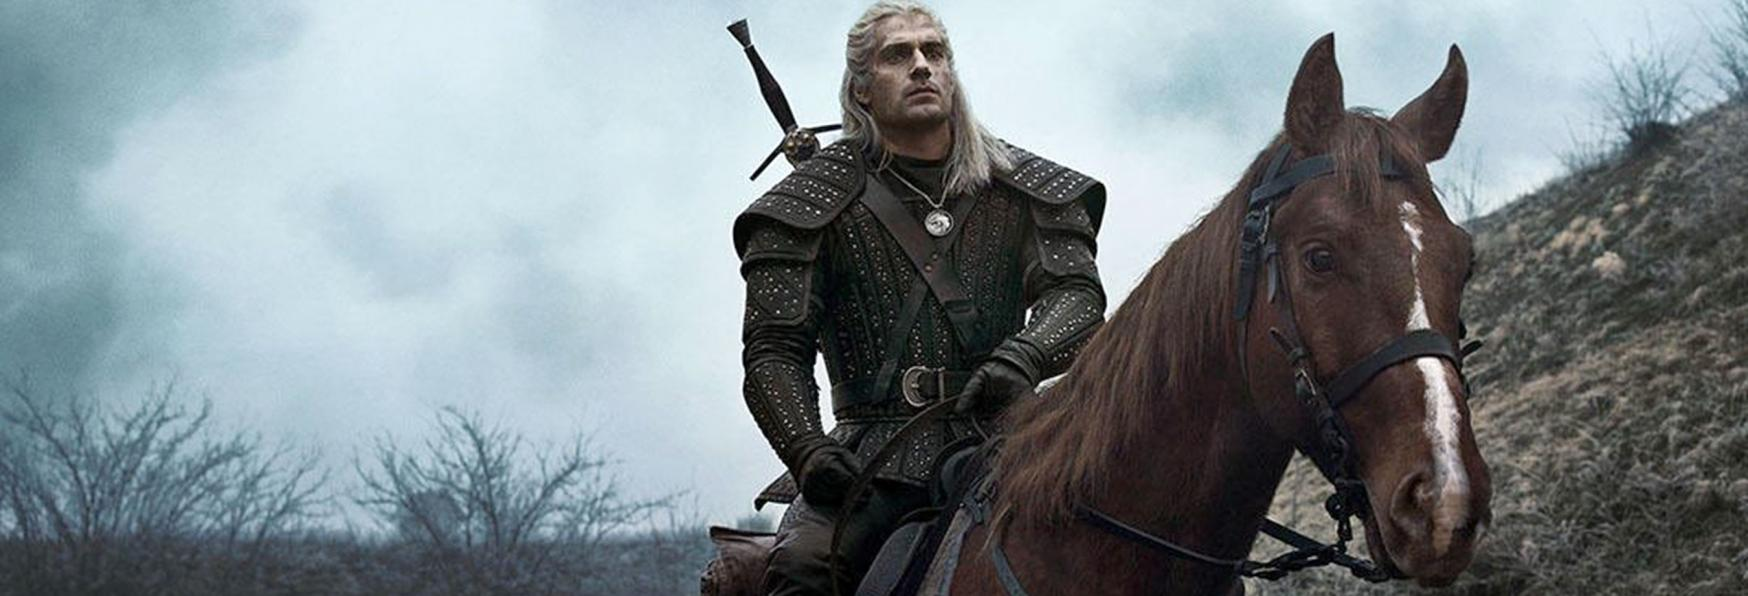 The Witcher: Netflix fa bingo - Recensione 2